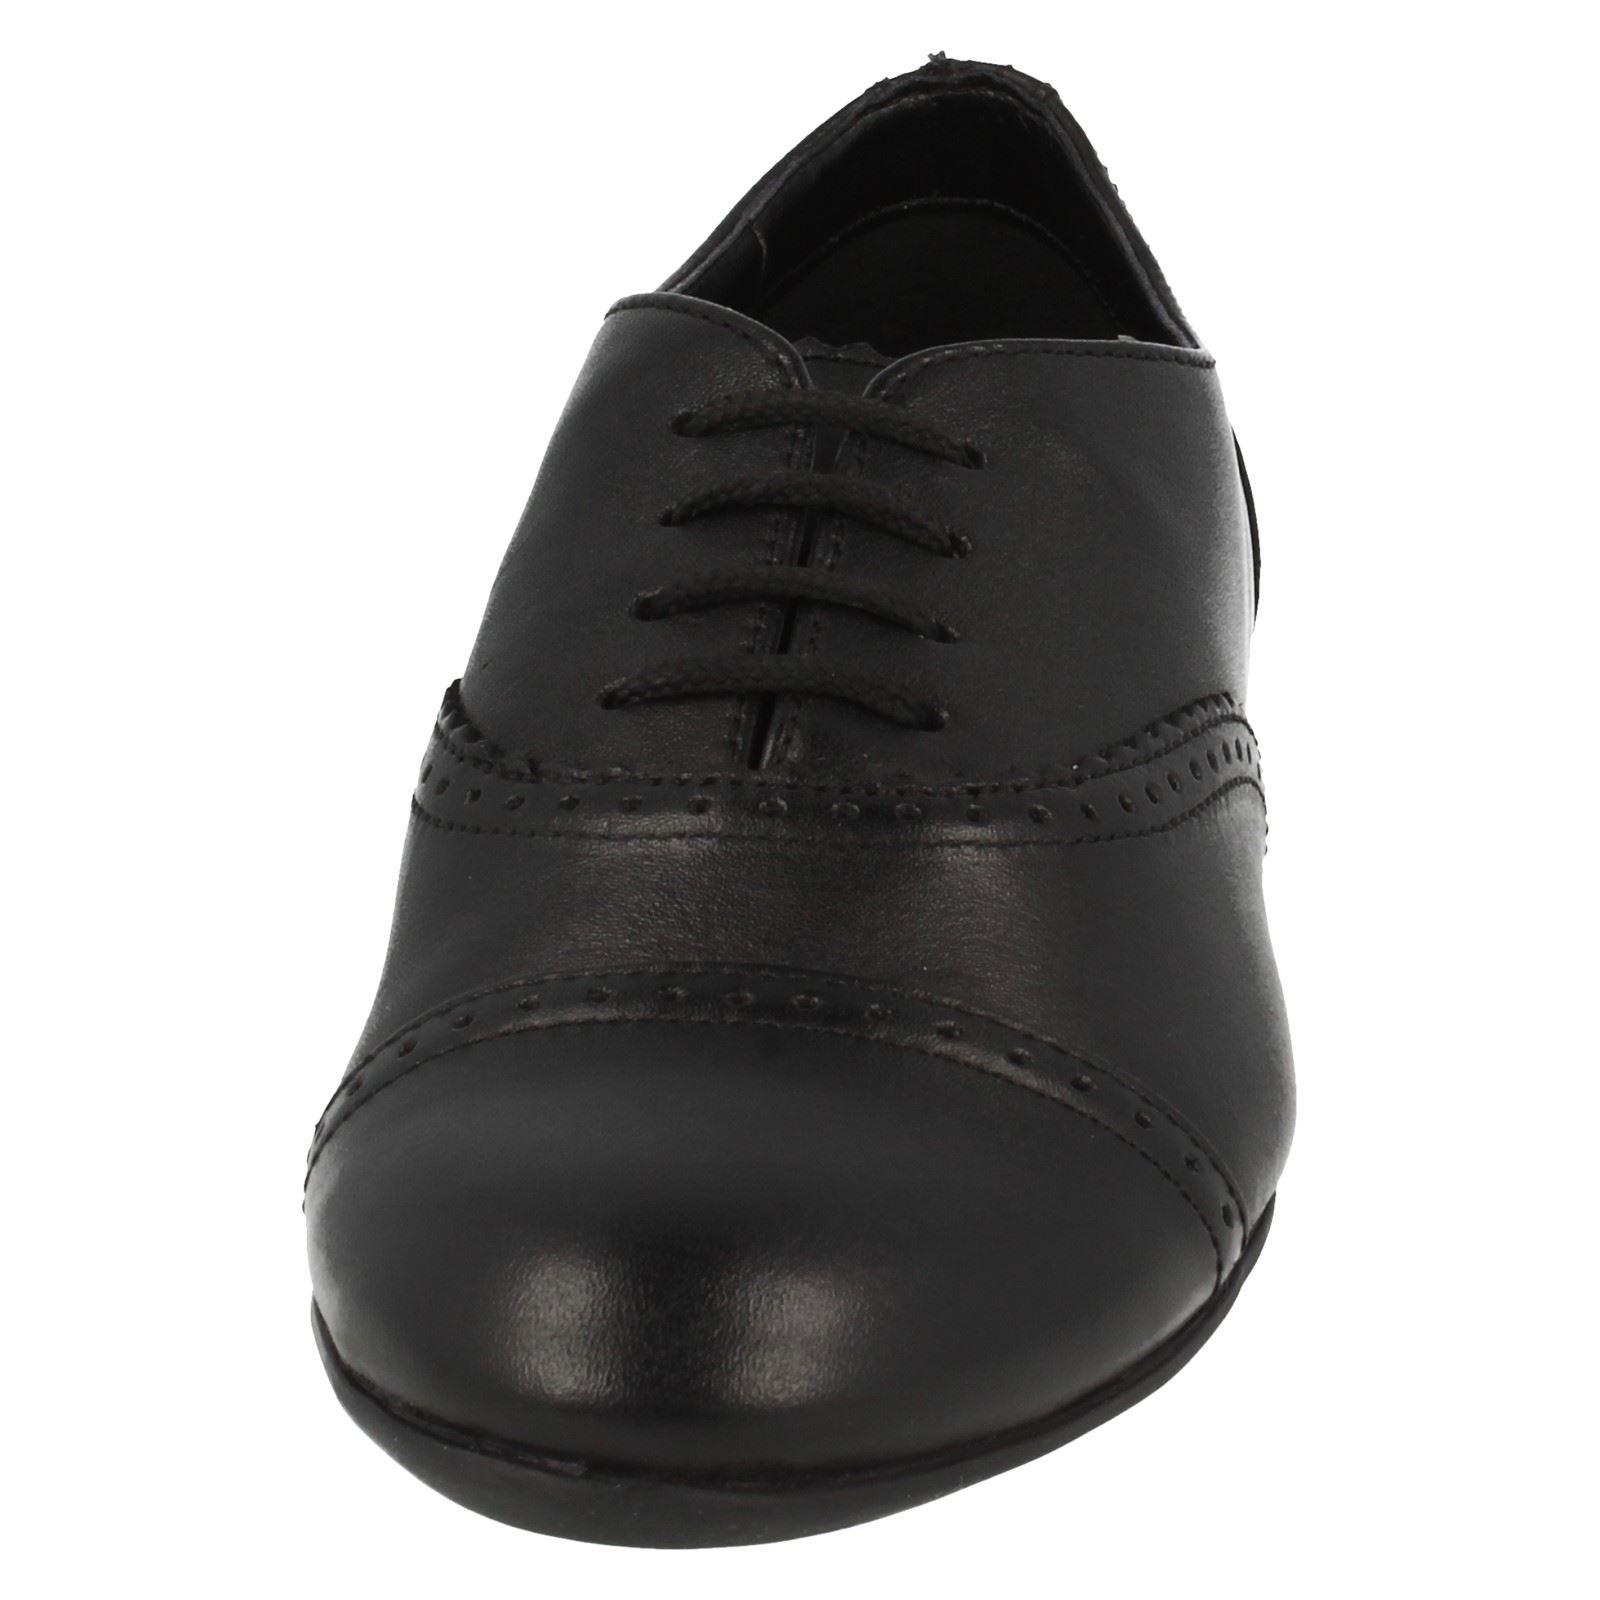 Clarks Filles Smart School Shoe Erica dentelle